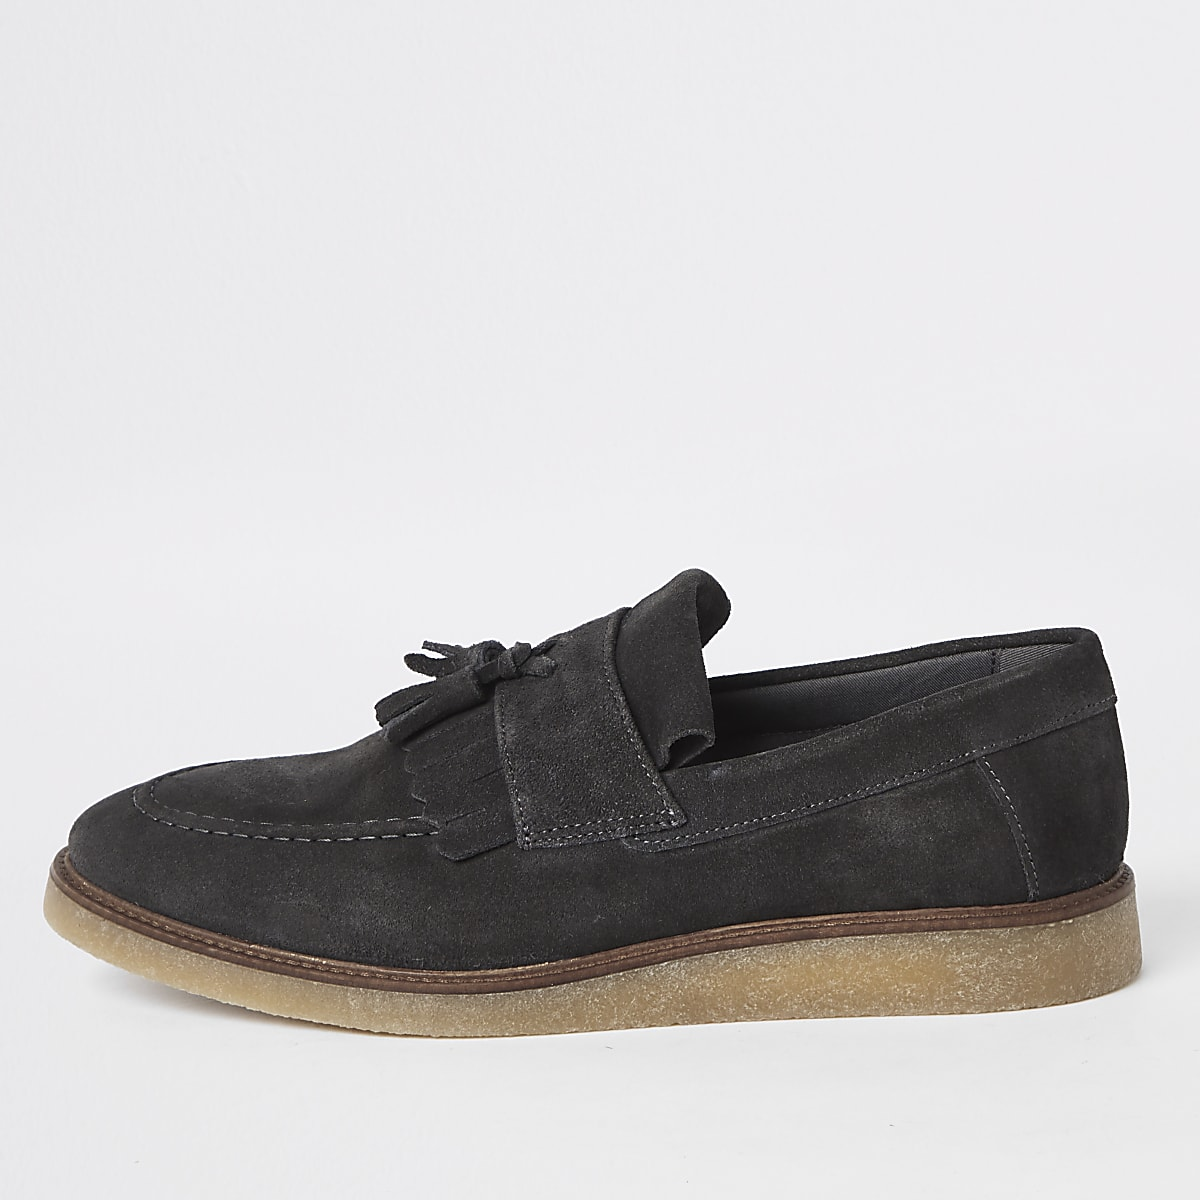 Dark grey suede fringe loafers